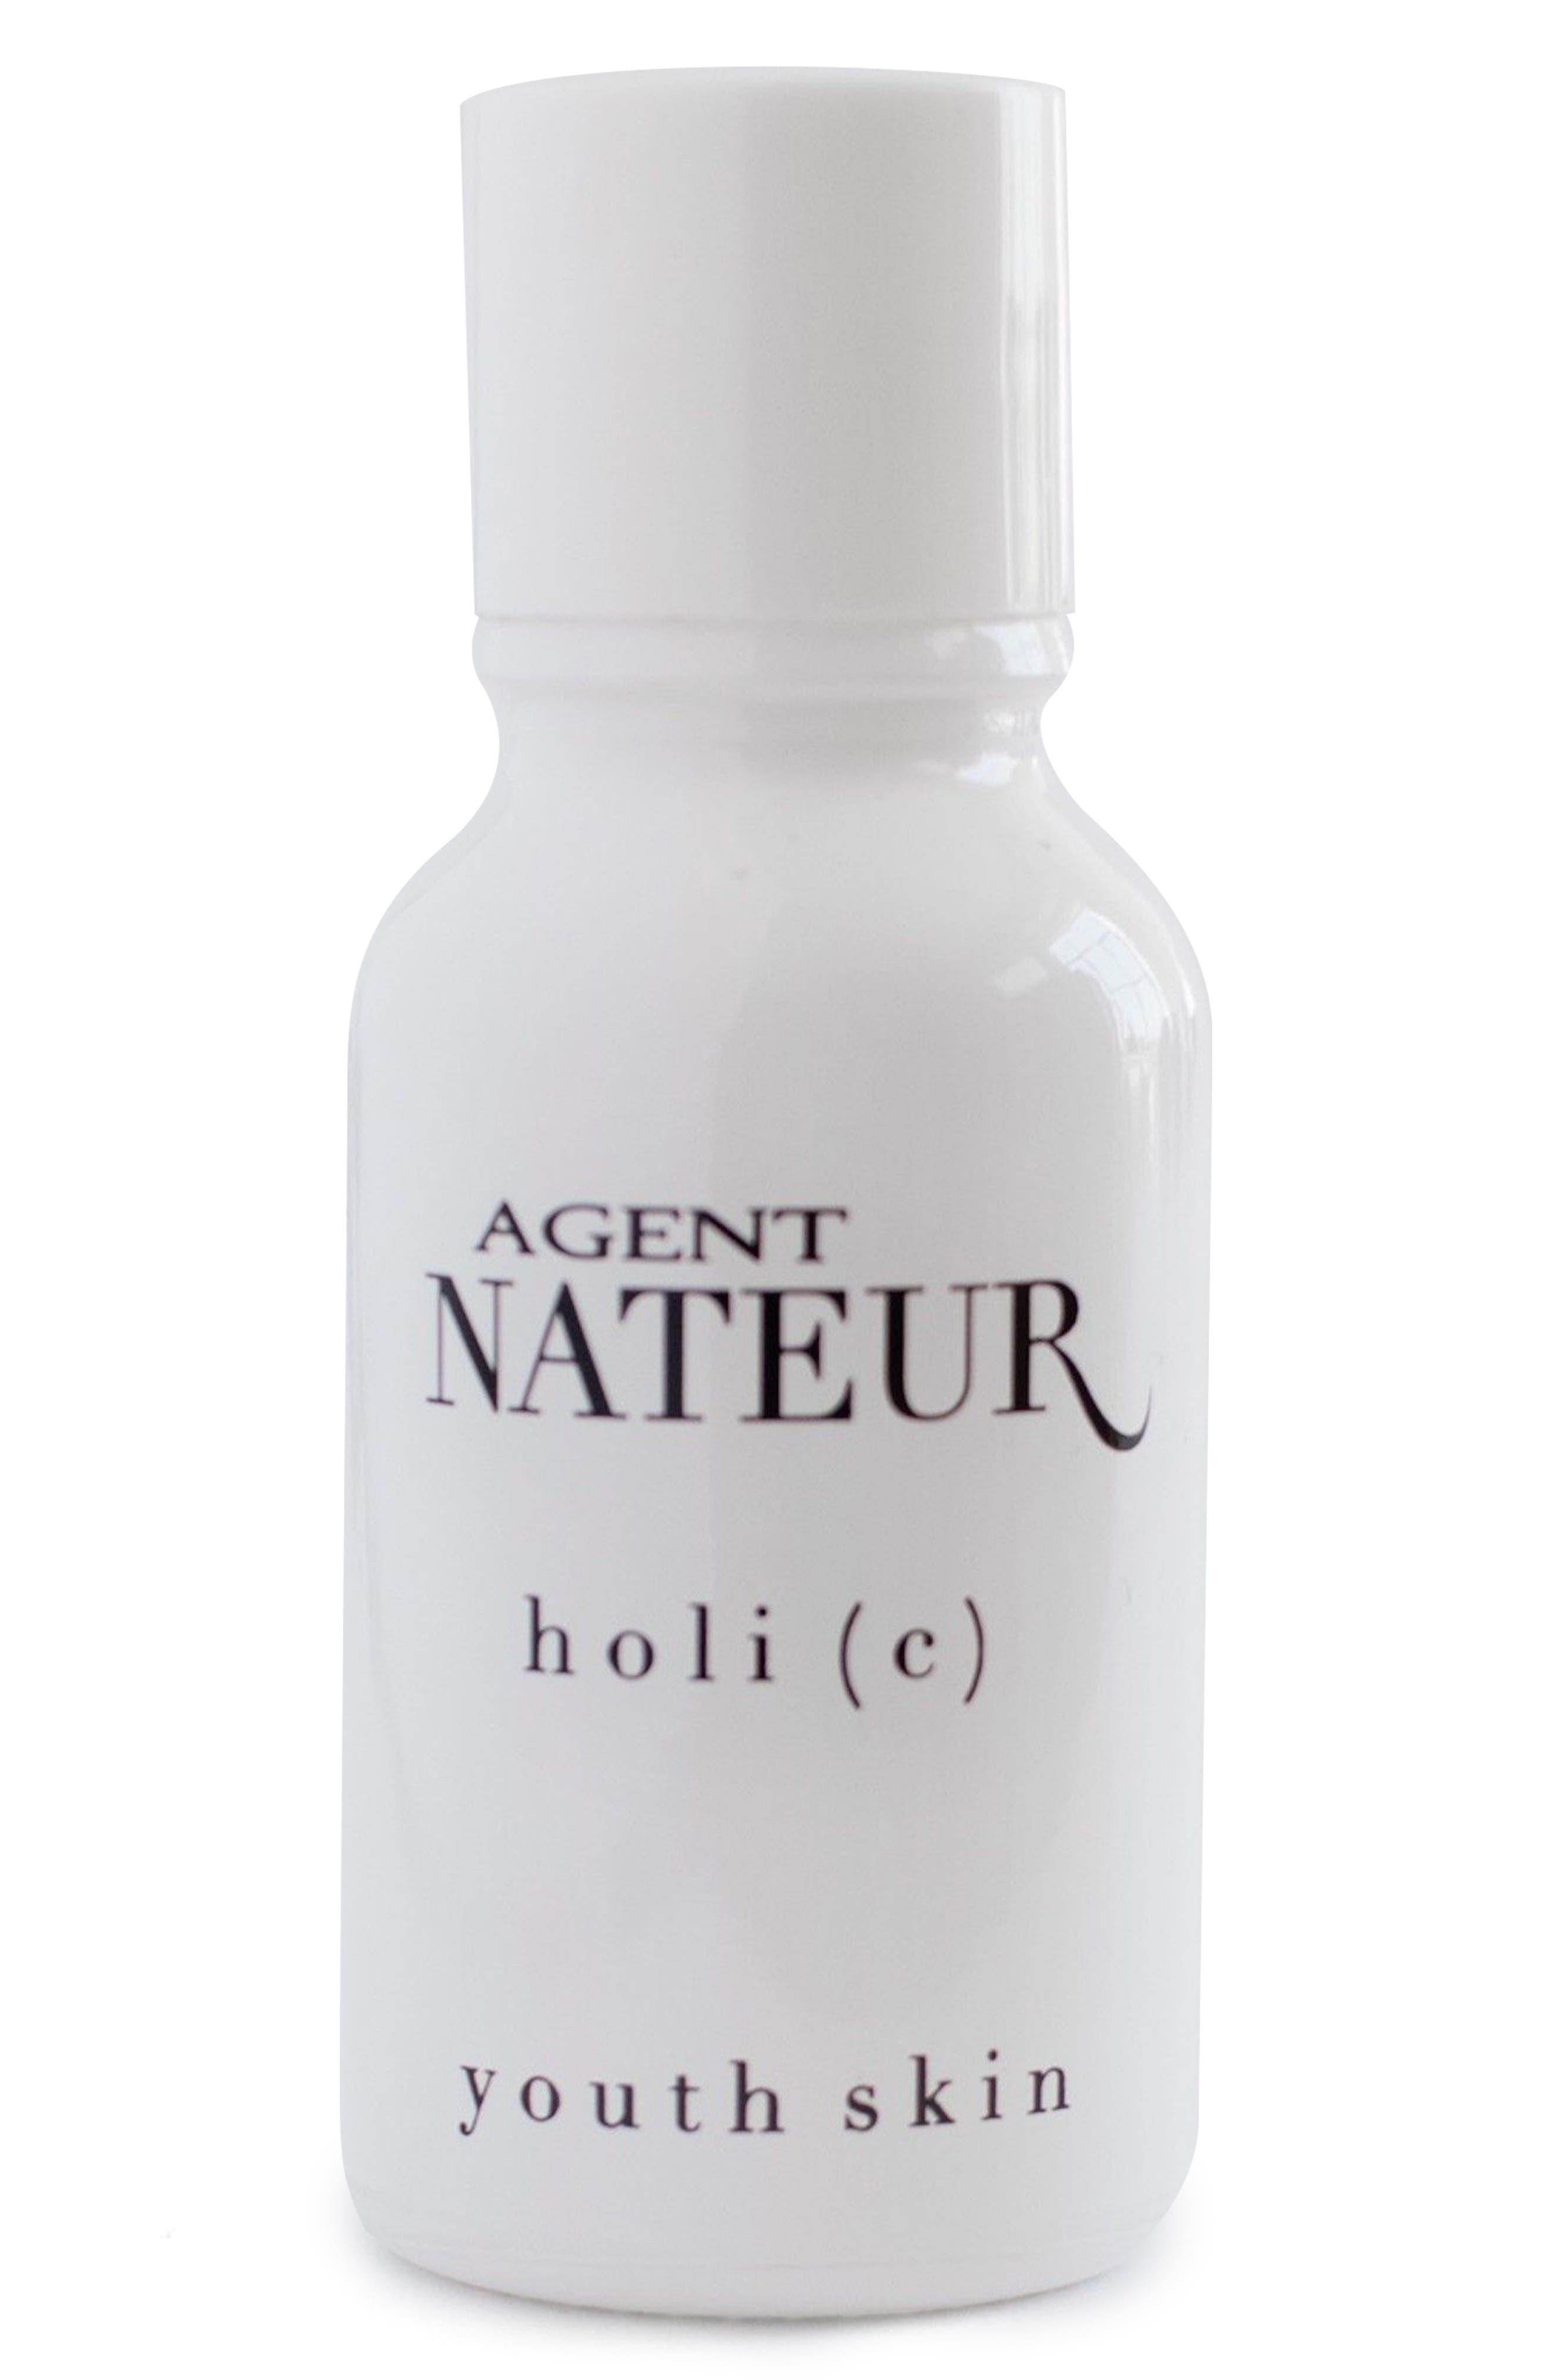 Holi(C) Youth Skin